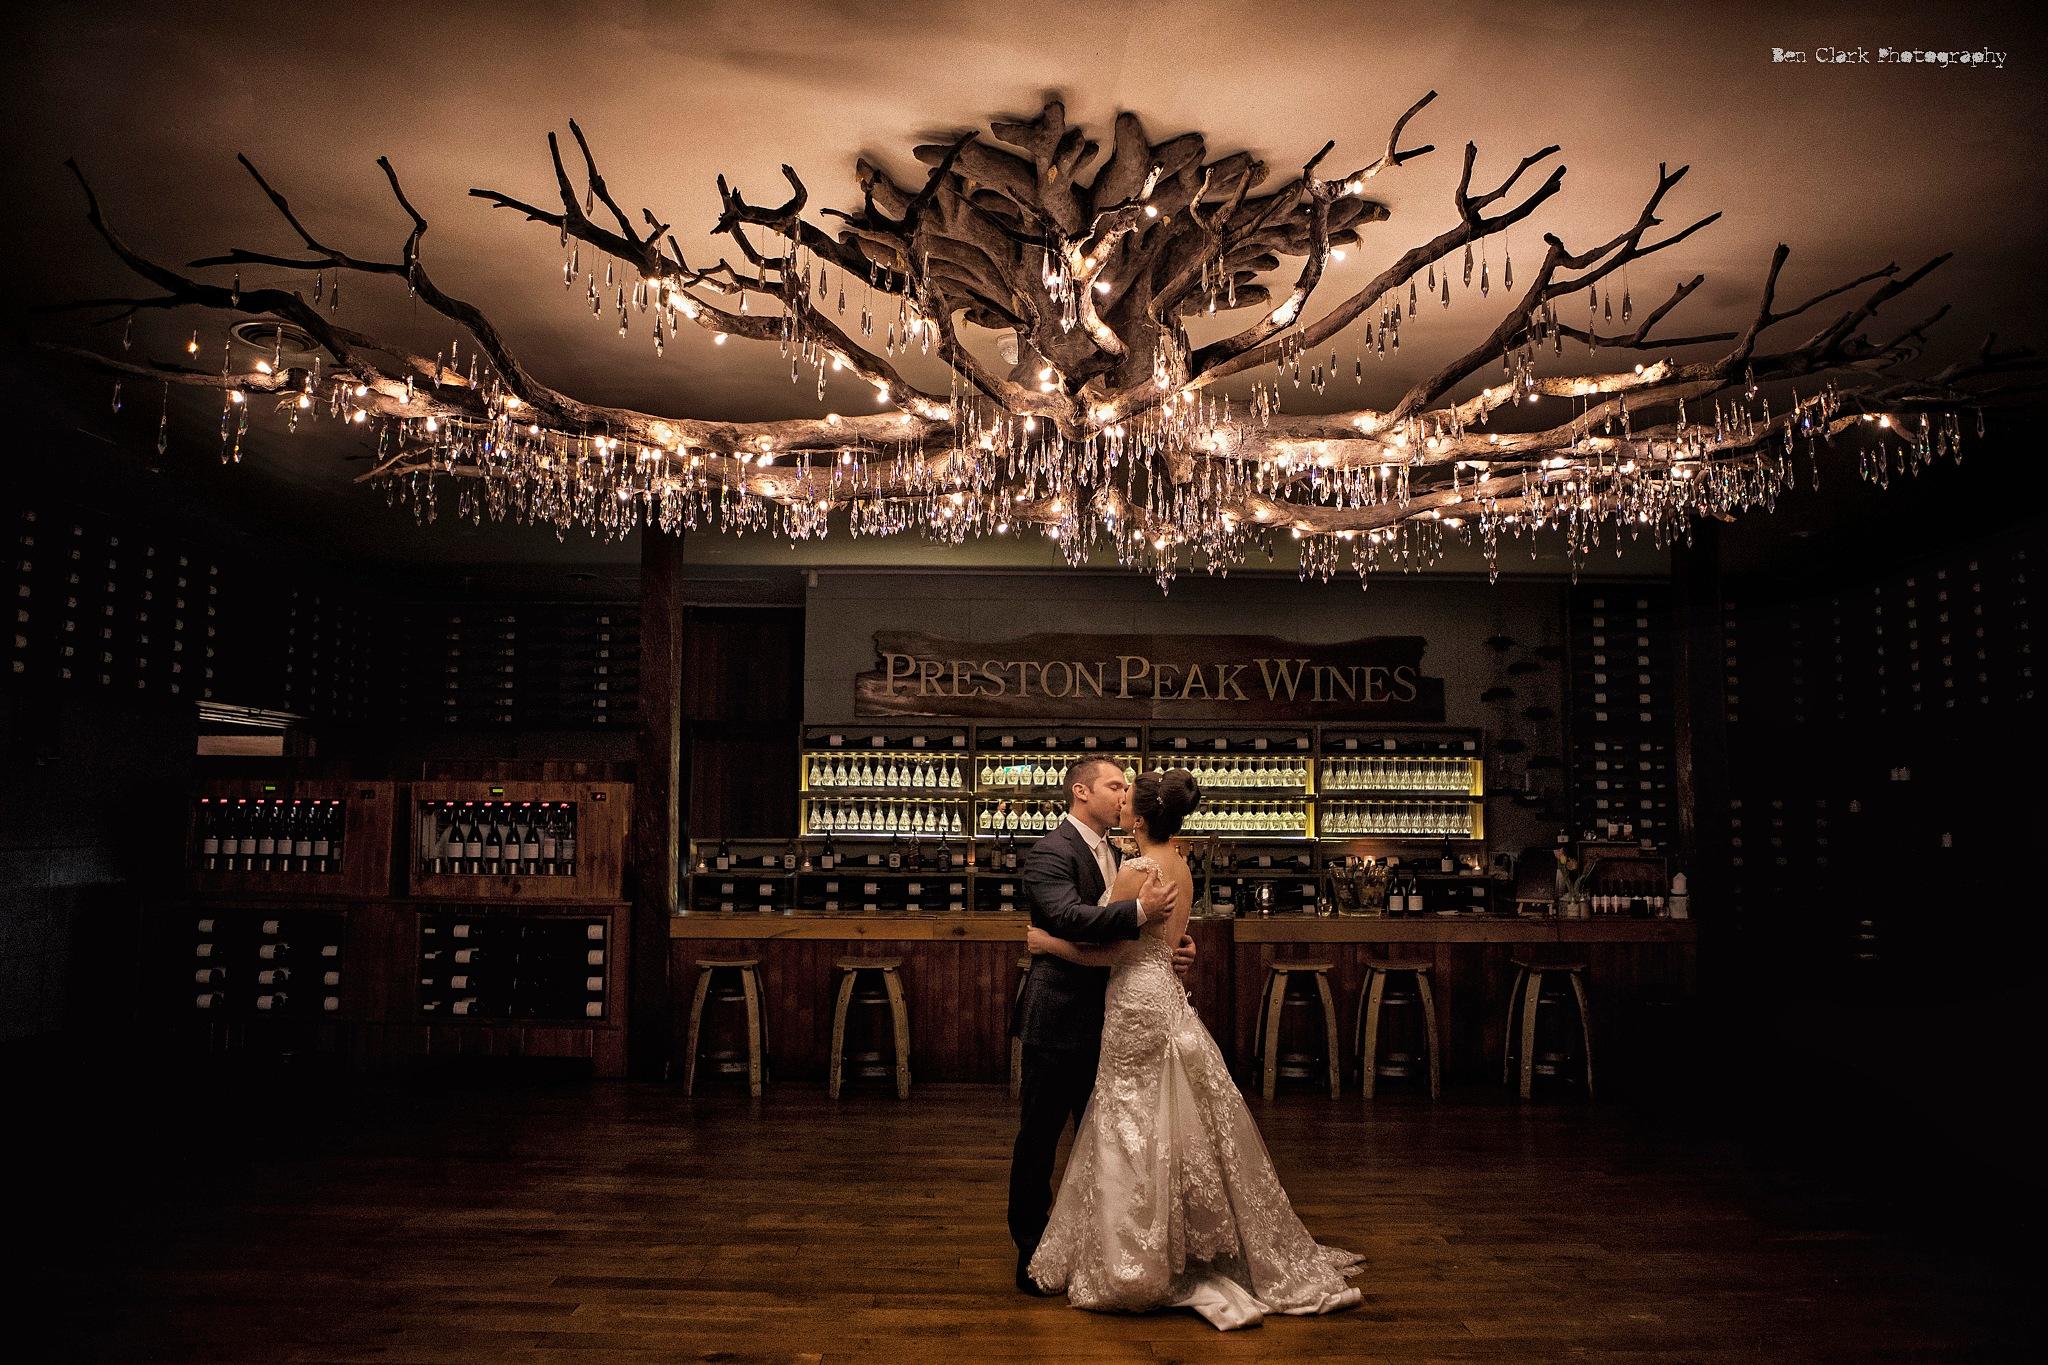 Preston Peak Winery by Ben Clark Photography